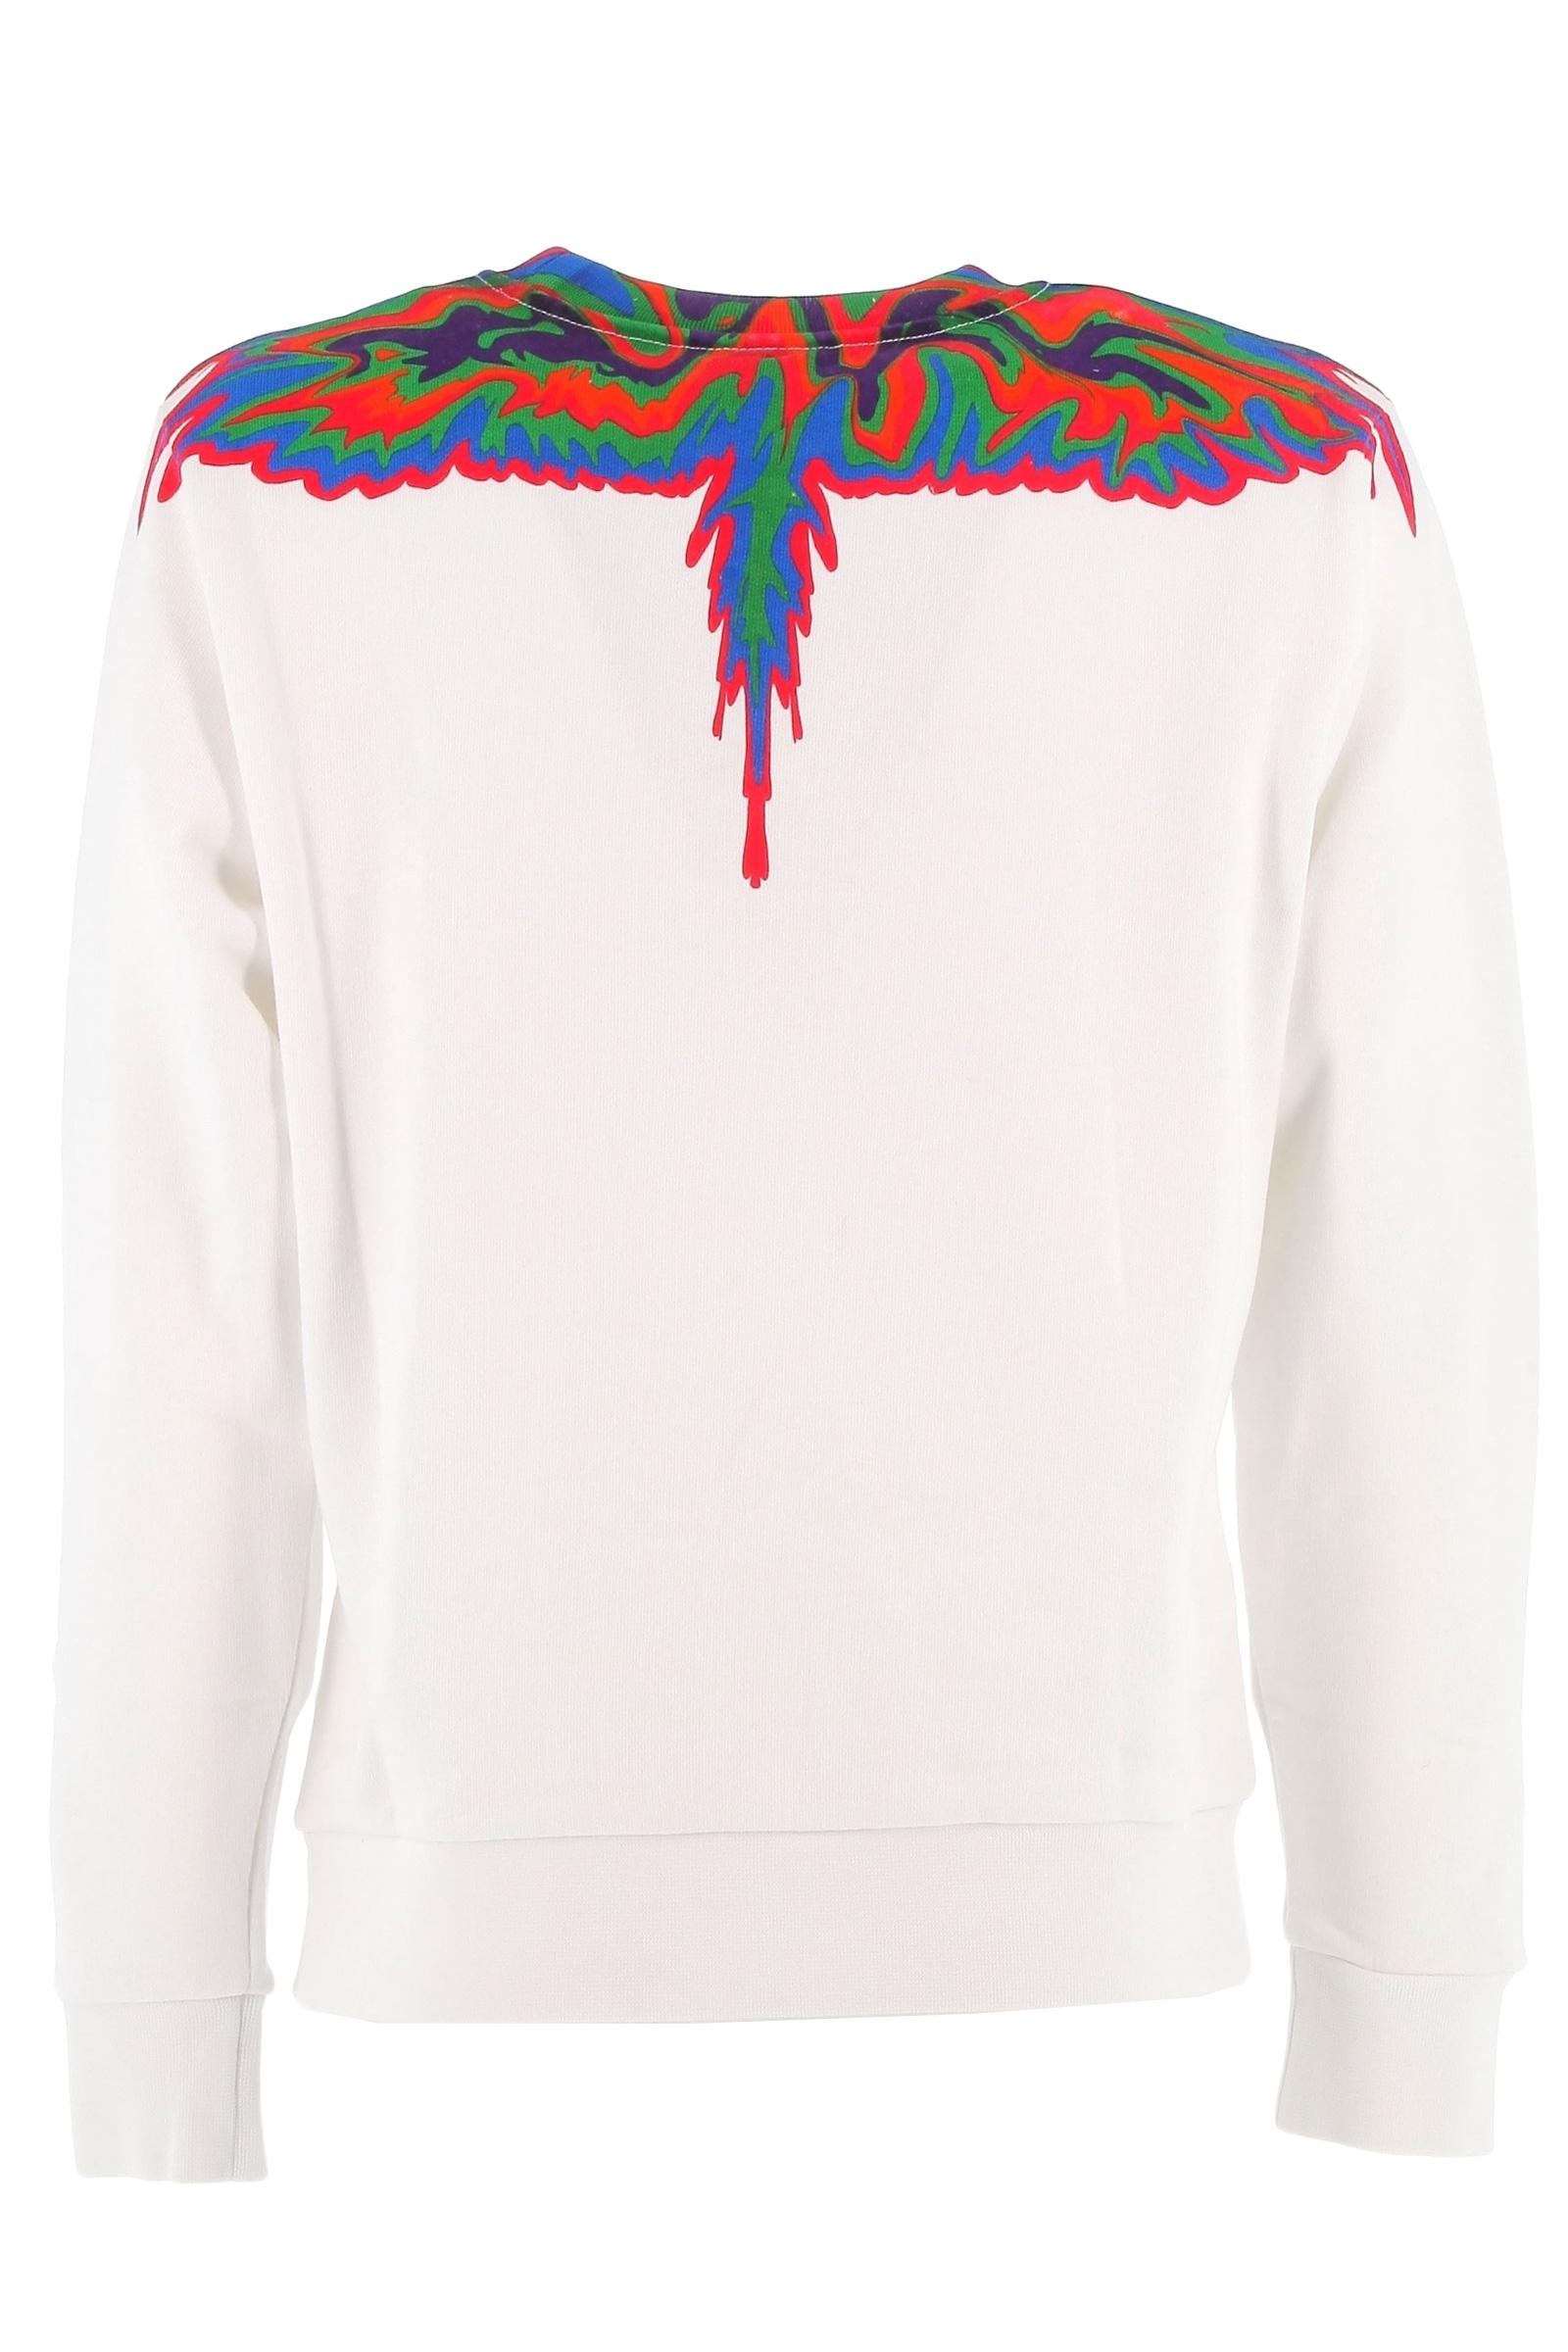 sweatshirt MARCELO BURLON KIDS OF MILAN | Sweatshirt | BMB20060020B000